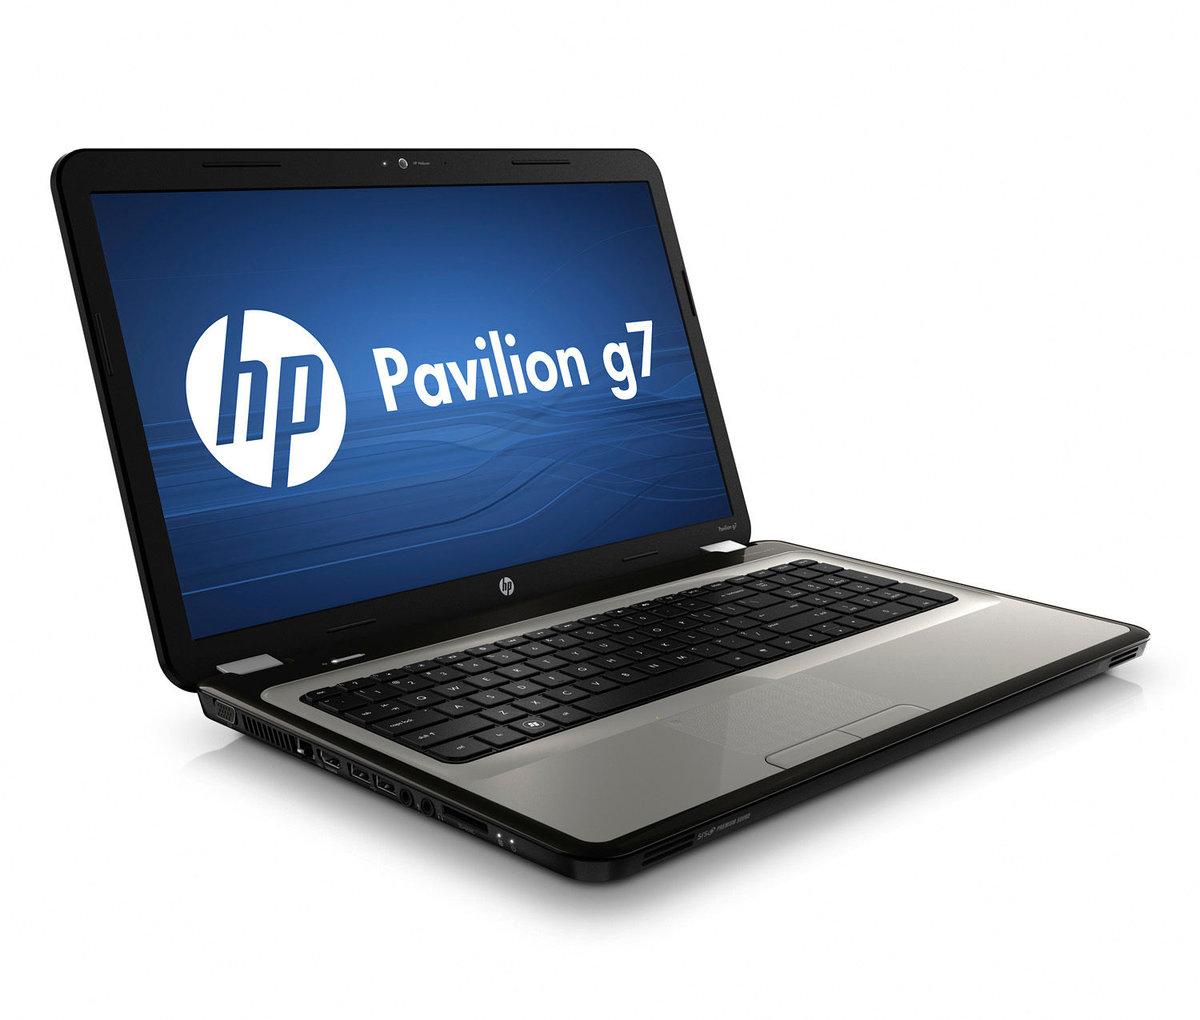 HP Pavilion g7-1070us - Core i3 380M / 2.53 GHz - RAM 4 GB - HDD 500 GB -  DVD±RW (±R DL) / DVD-RAM - HD Graphics - WLAN : Bluetooth, 802.11b/g/n ...